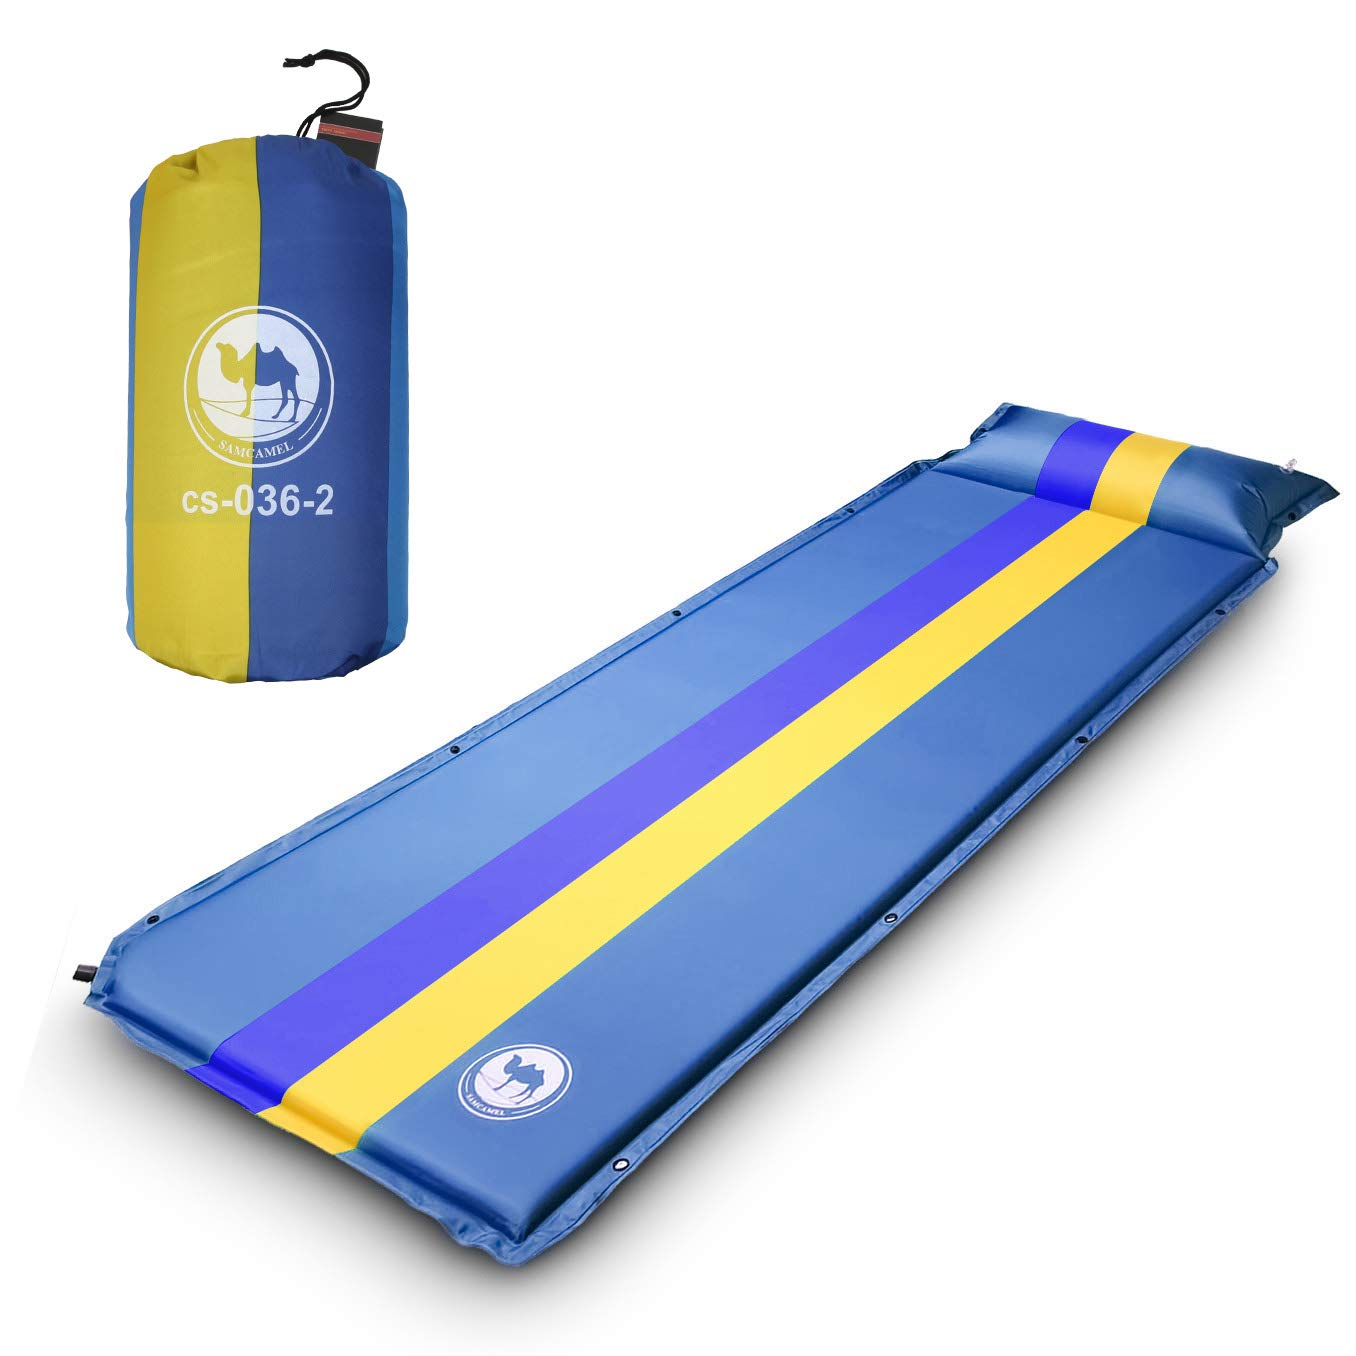 EKKONG Esterillas Autoinflables, Colchoneta de Camping con Bolsa, para Camping, Viajes, Senderismo, Mochilero, Playa, 190 x 68 x 3.5 cm